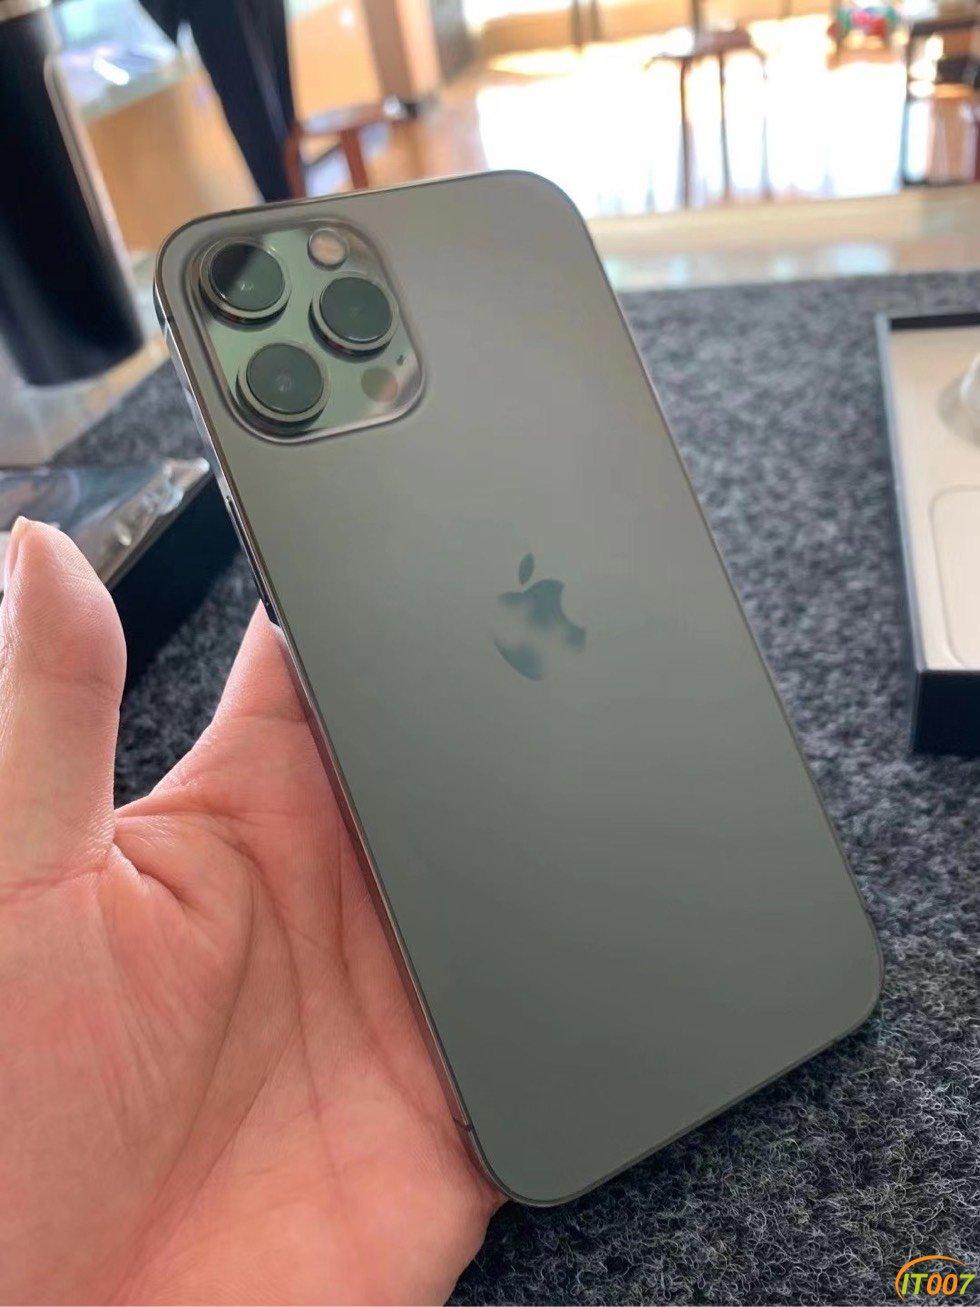 iphone12promax 港版黑色256g 成色99新电池100 12月10号激活